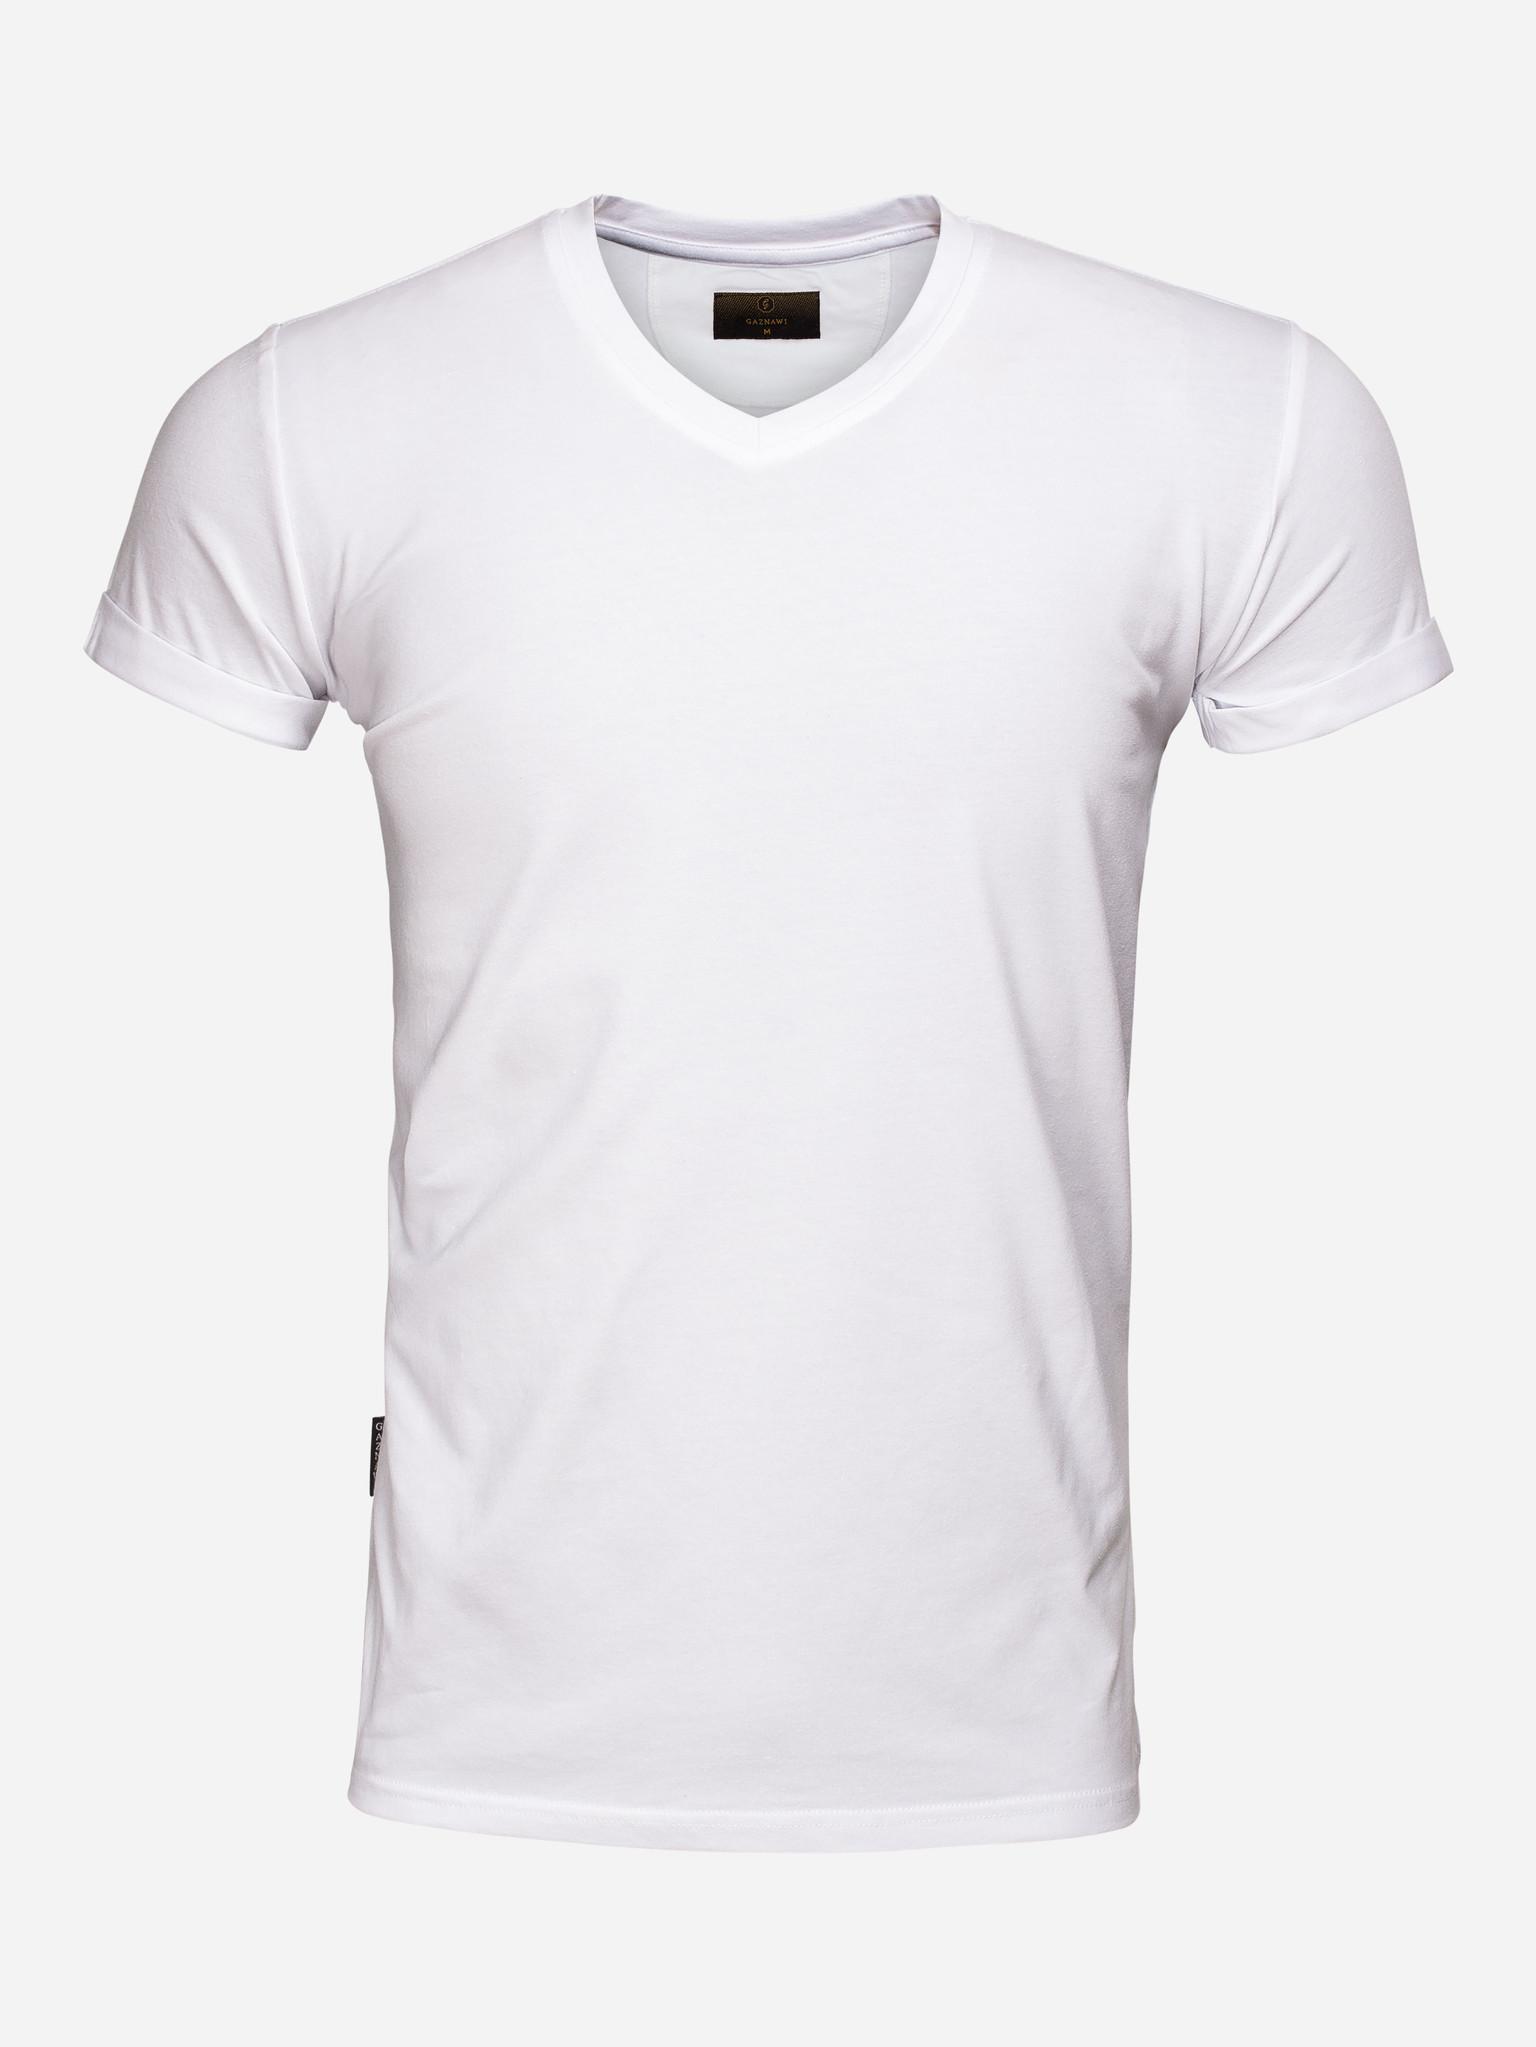 Wam Denim T-Shirt 69032 White Maat: 3XL